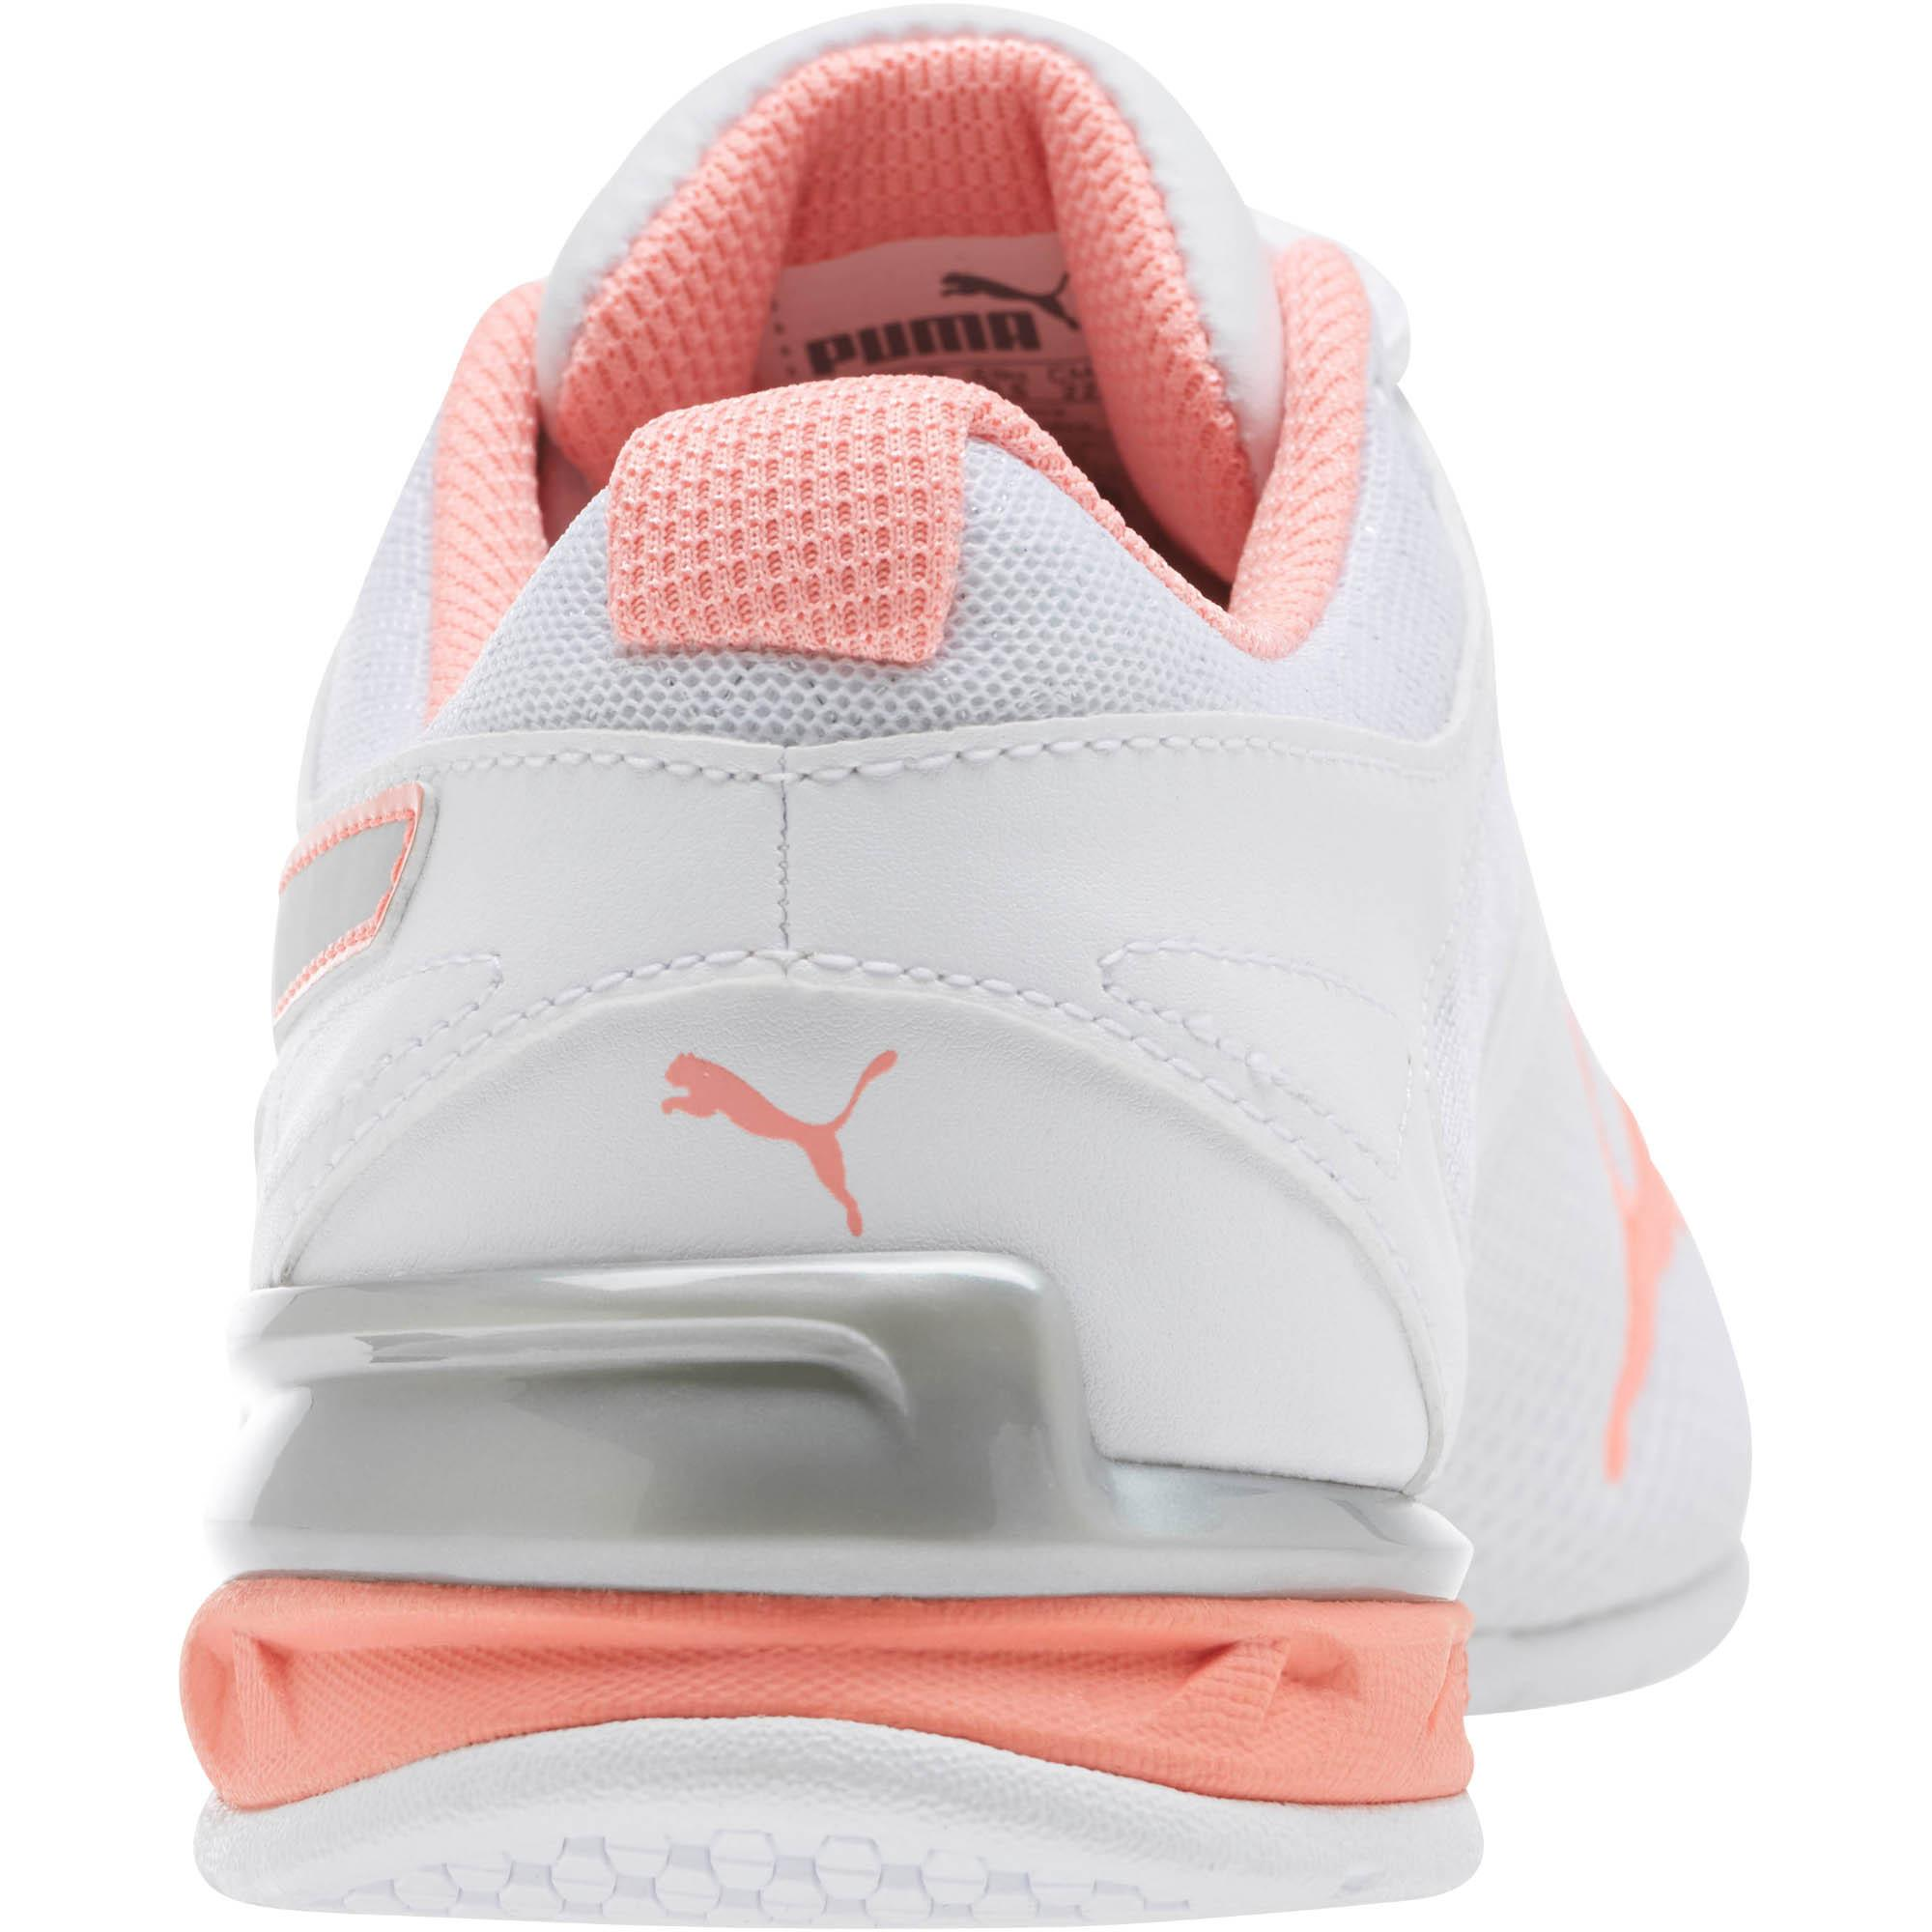 PUMA - Multicolor Tazon 6 Metallic Women s Sneakers - Lyst. View fullscreen 738a8cef3